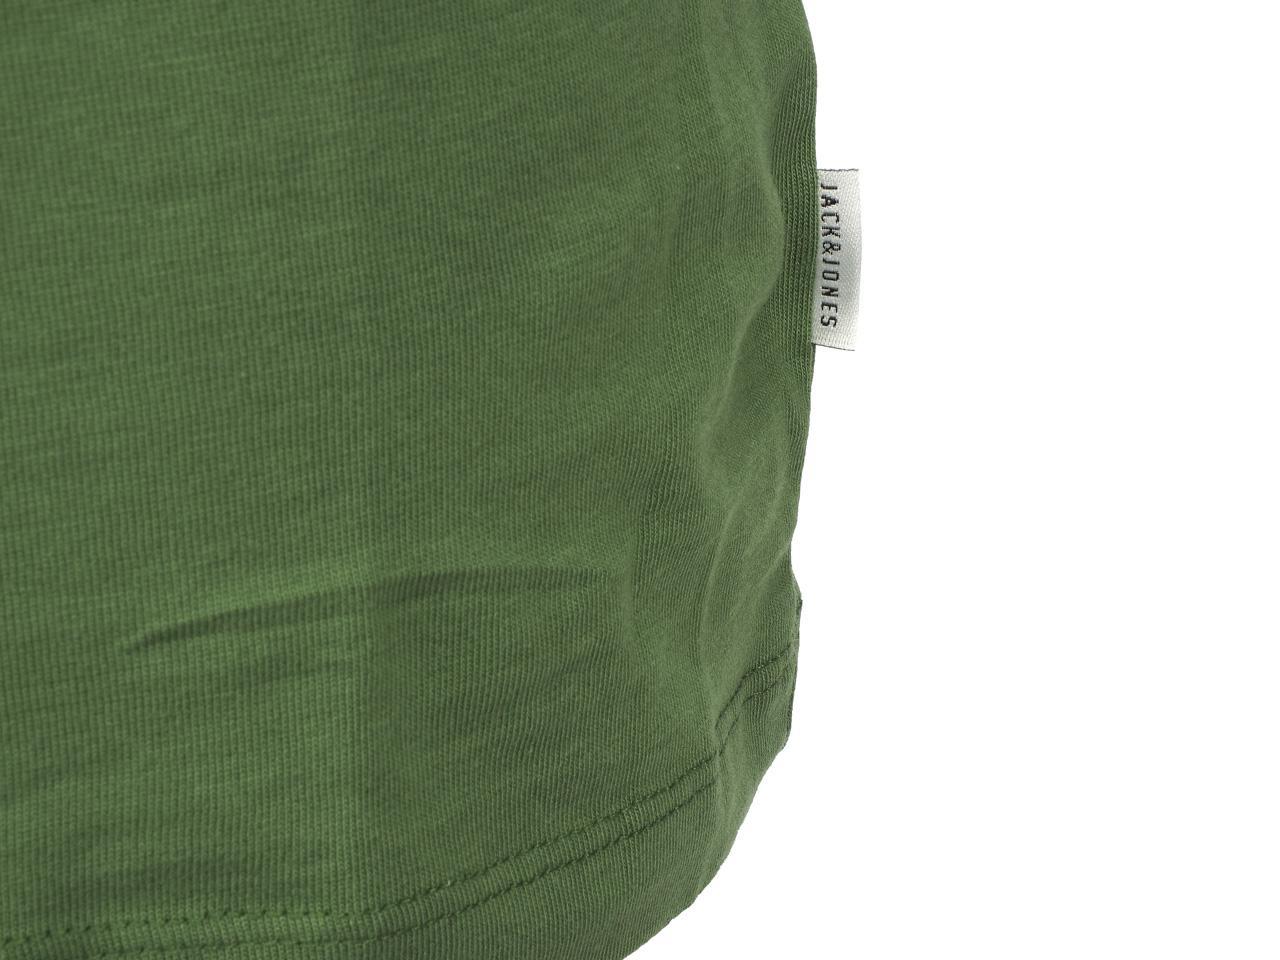 Short-Sleeve-T-Shirt-Jack-and-Jones-Dave-Vineyard-Green-Tee-44186-Does-Not thumbnail 4